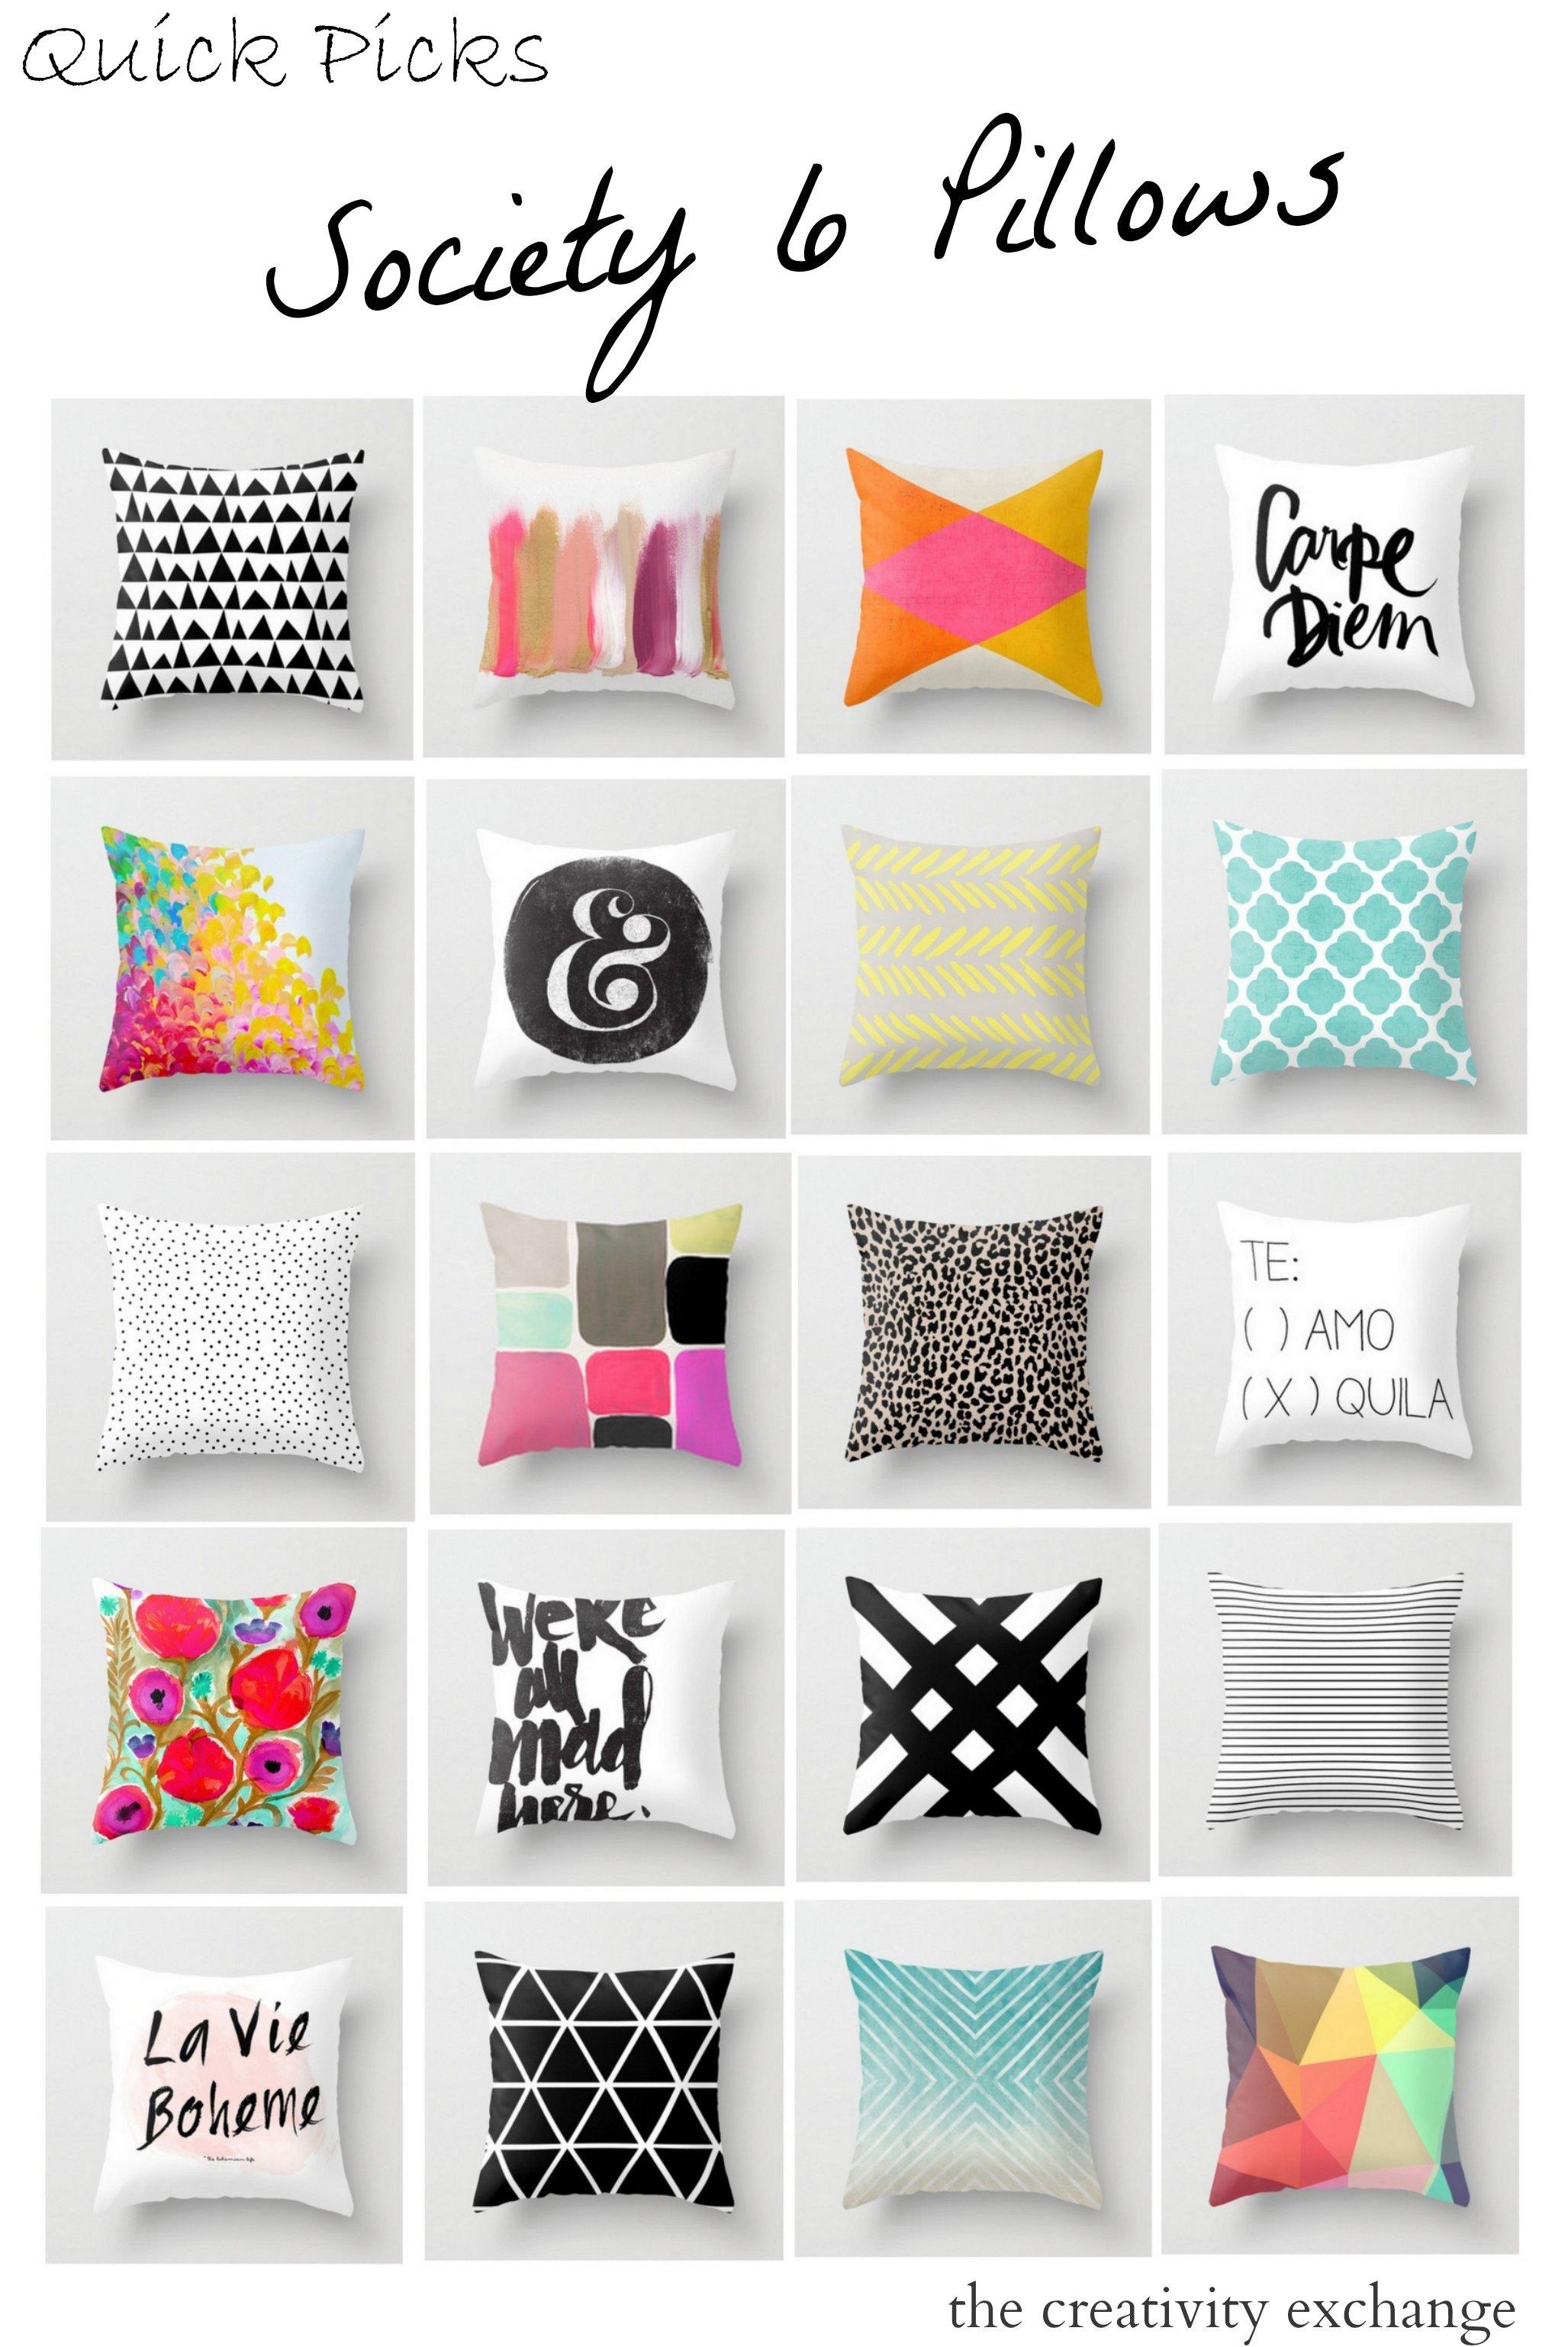 Quick Picks Society 6 Pillows